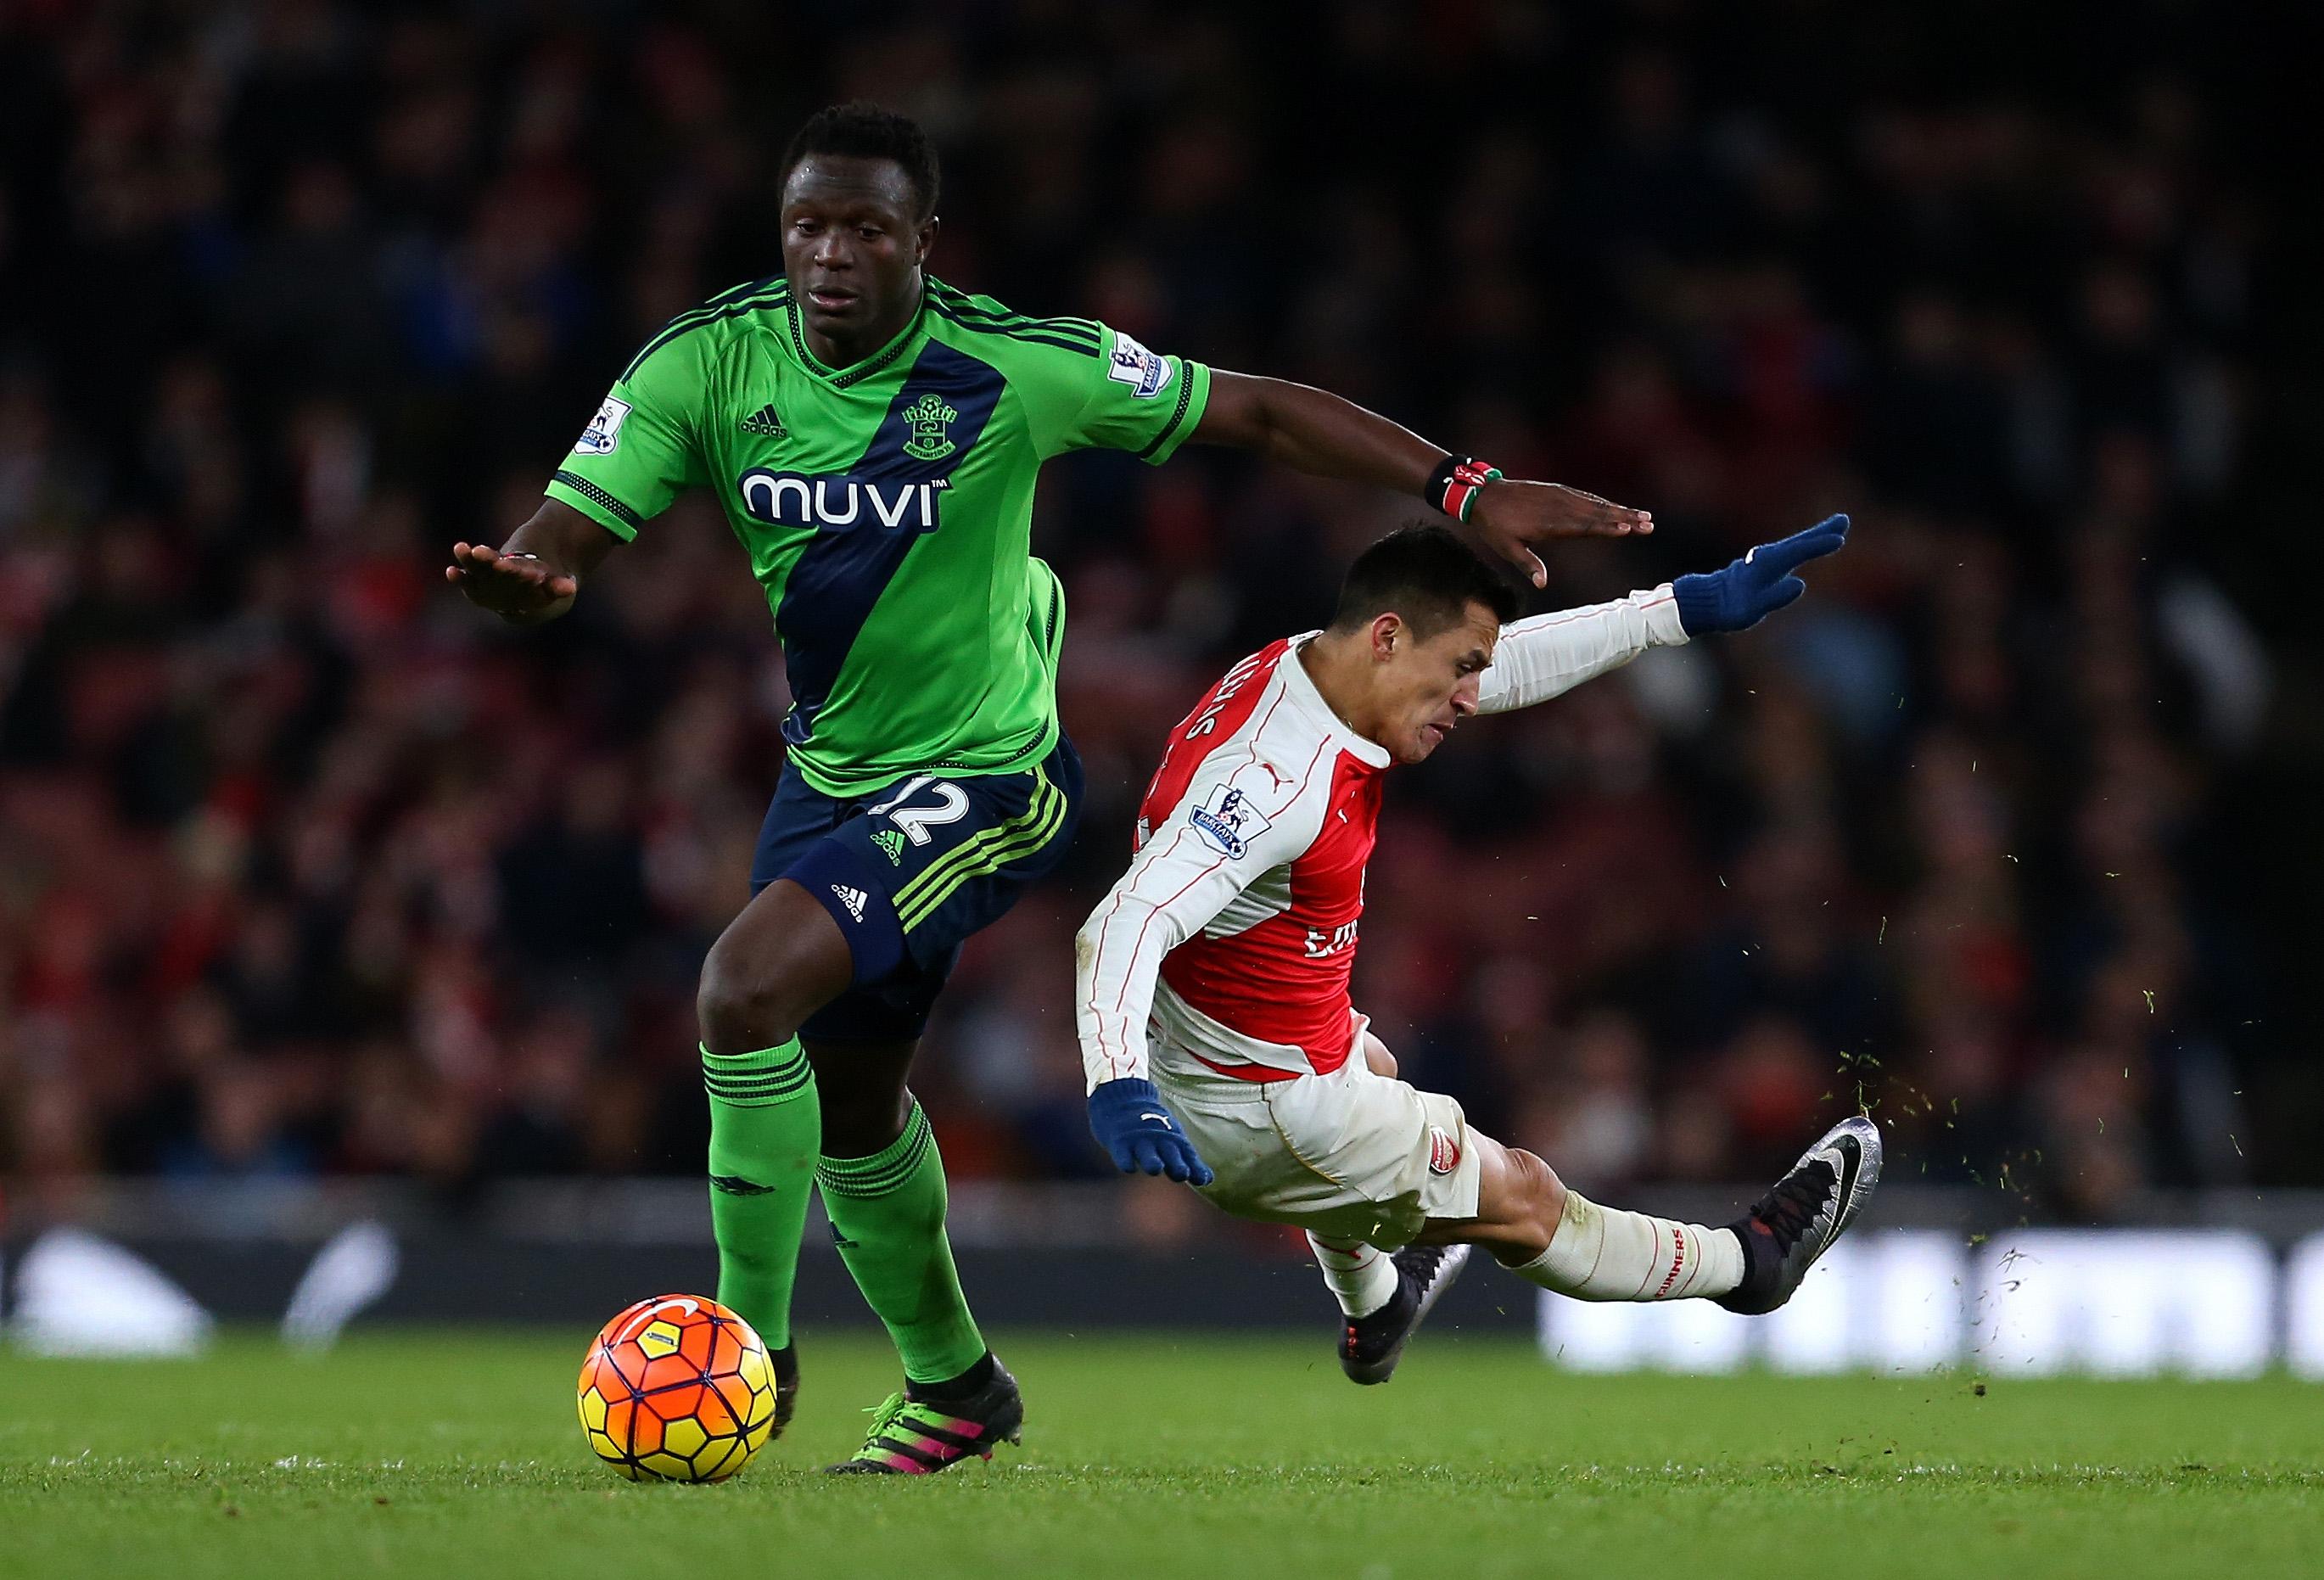 Arsenal ready to seal transfer of Southampton's Victor Wanyama